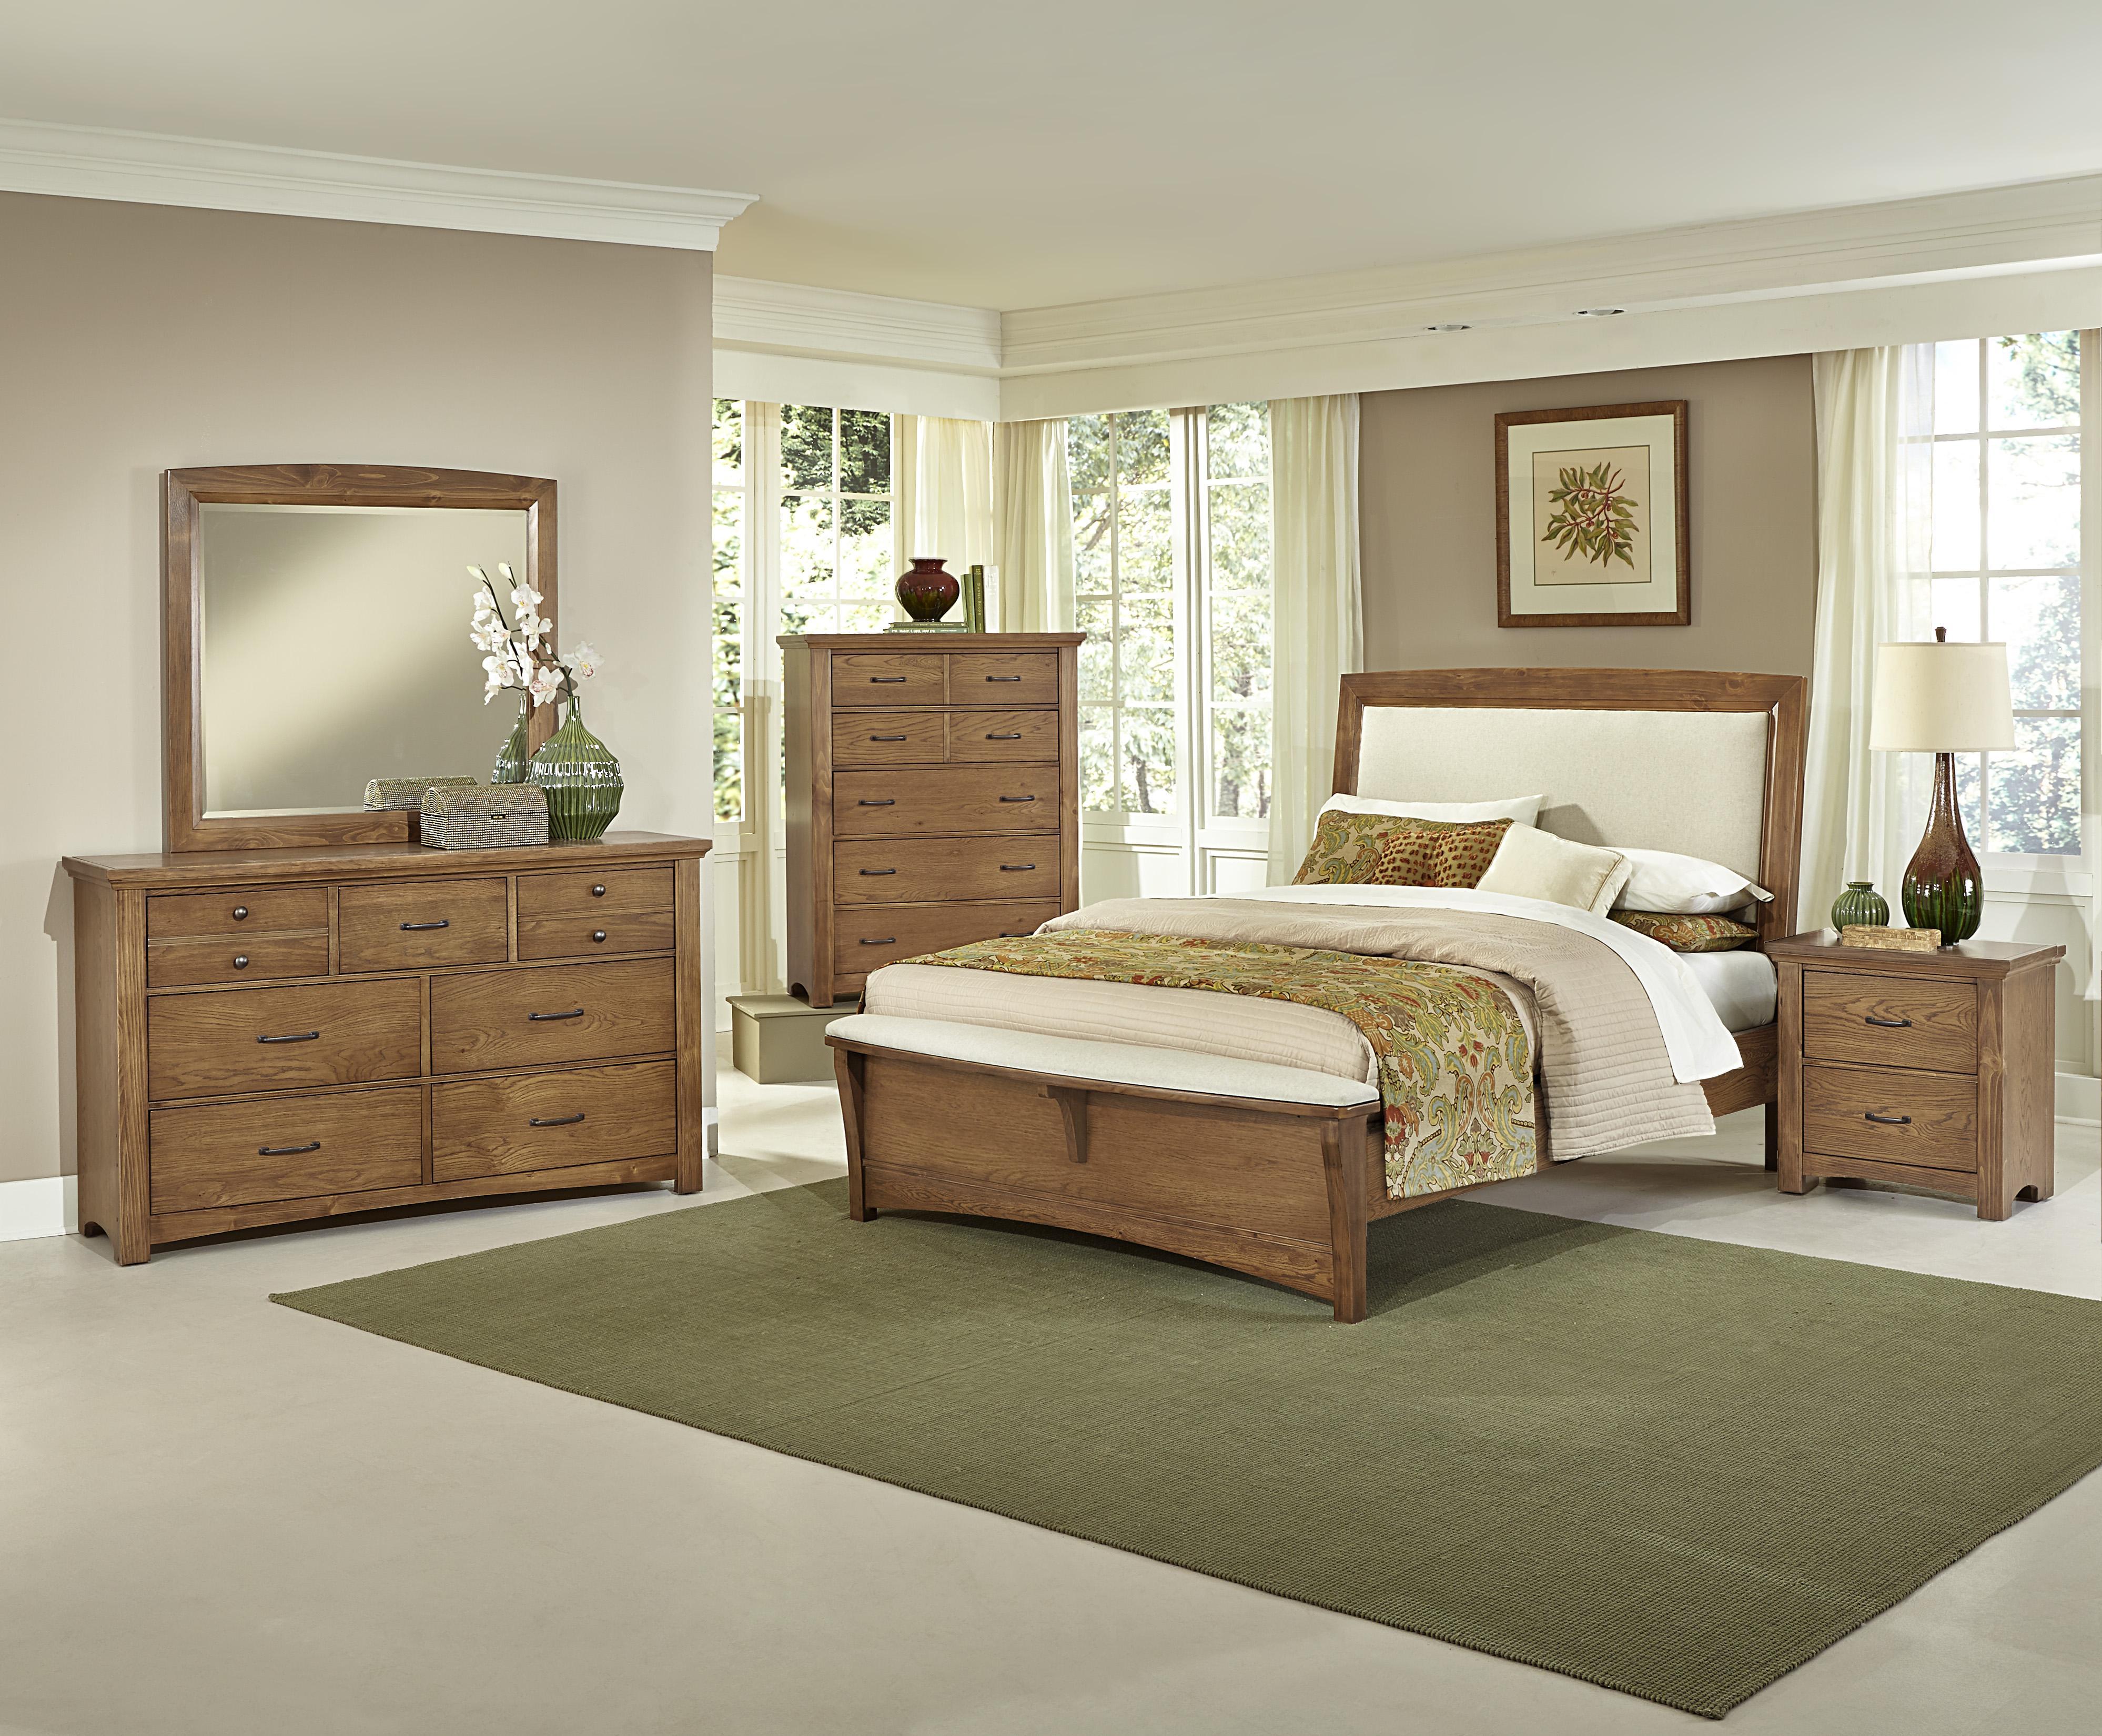 Vaughan Bassett Transitions King Bedroom Group - Item Number: BB63 K Bedroom Group 4